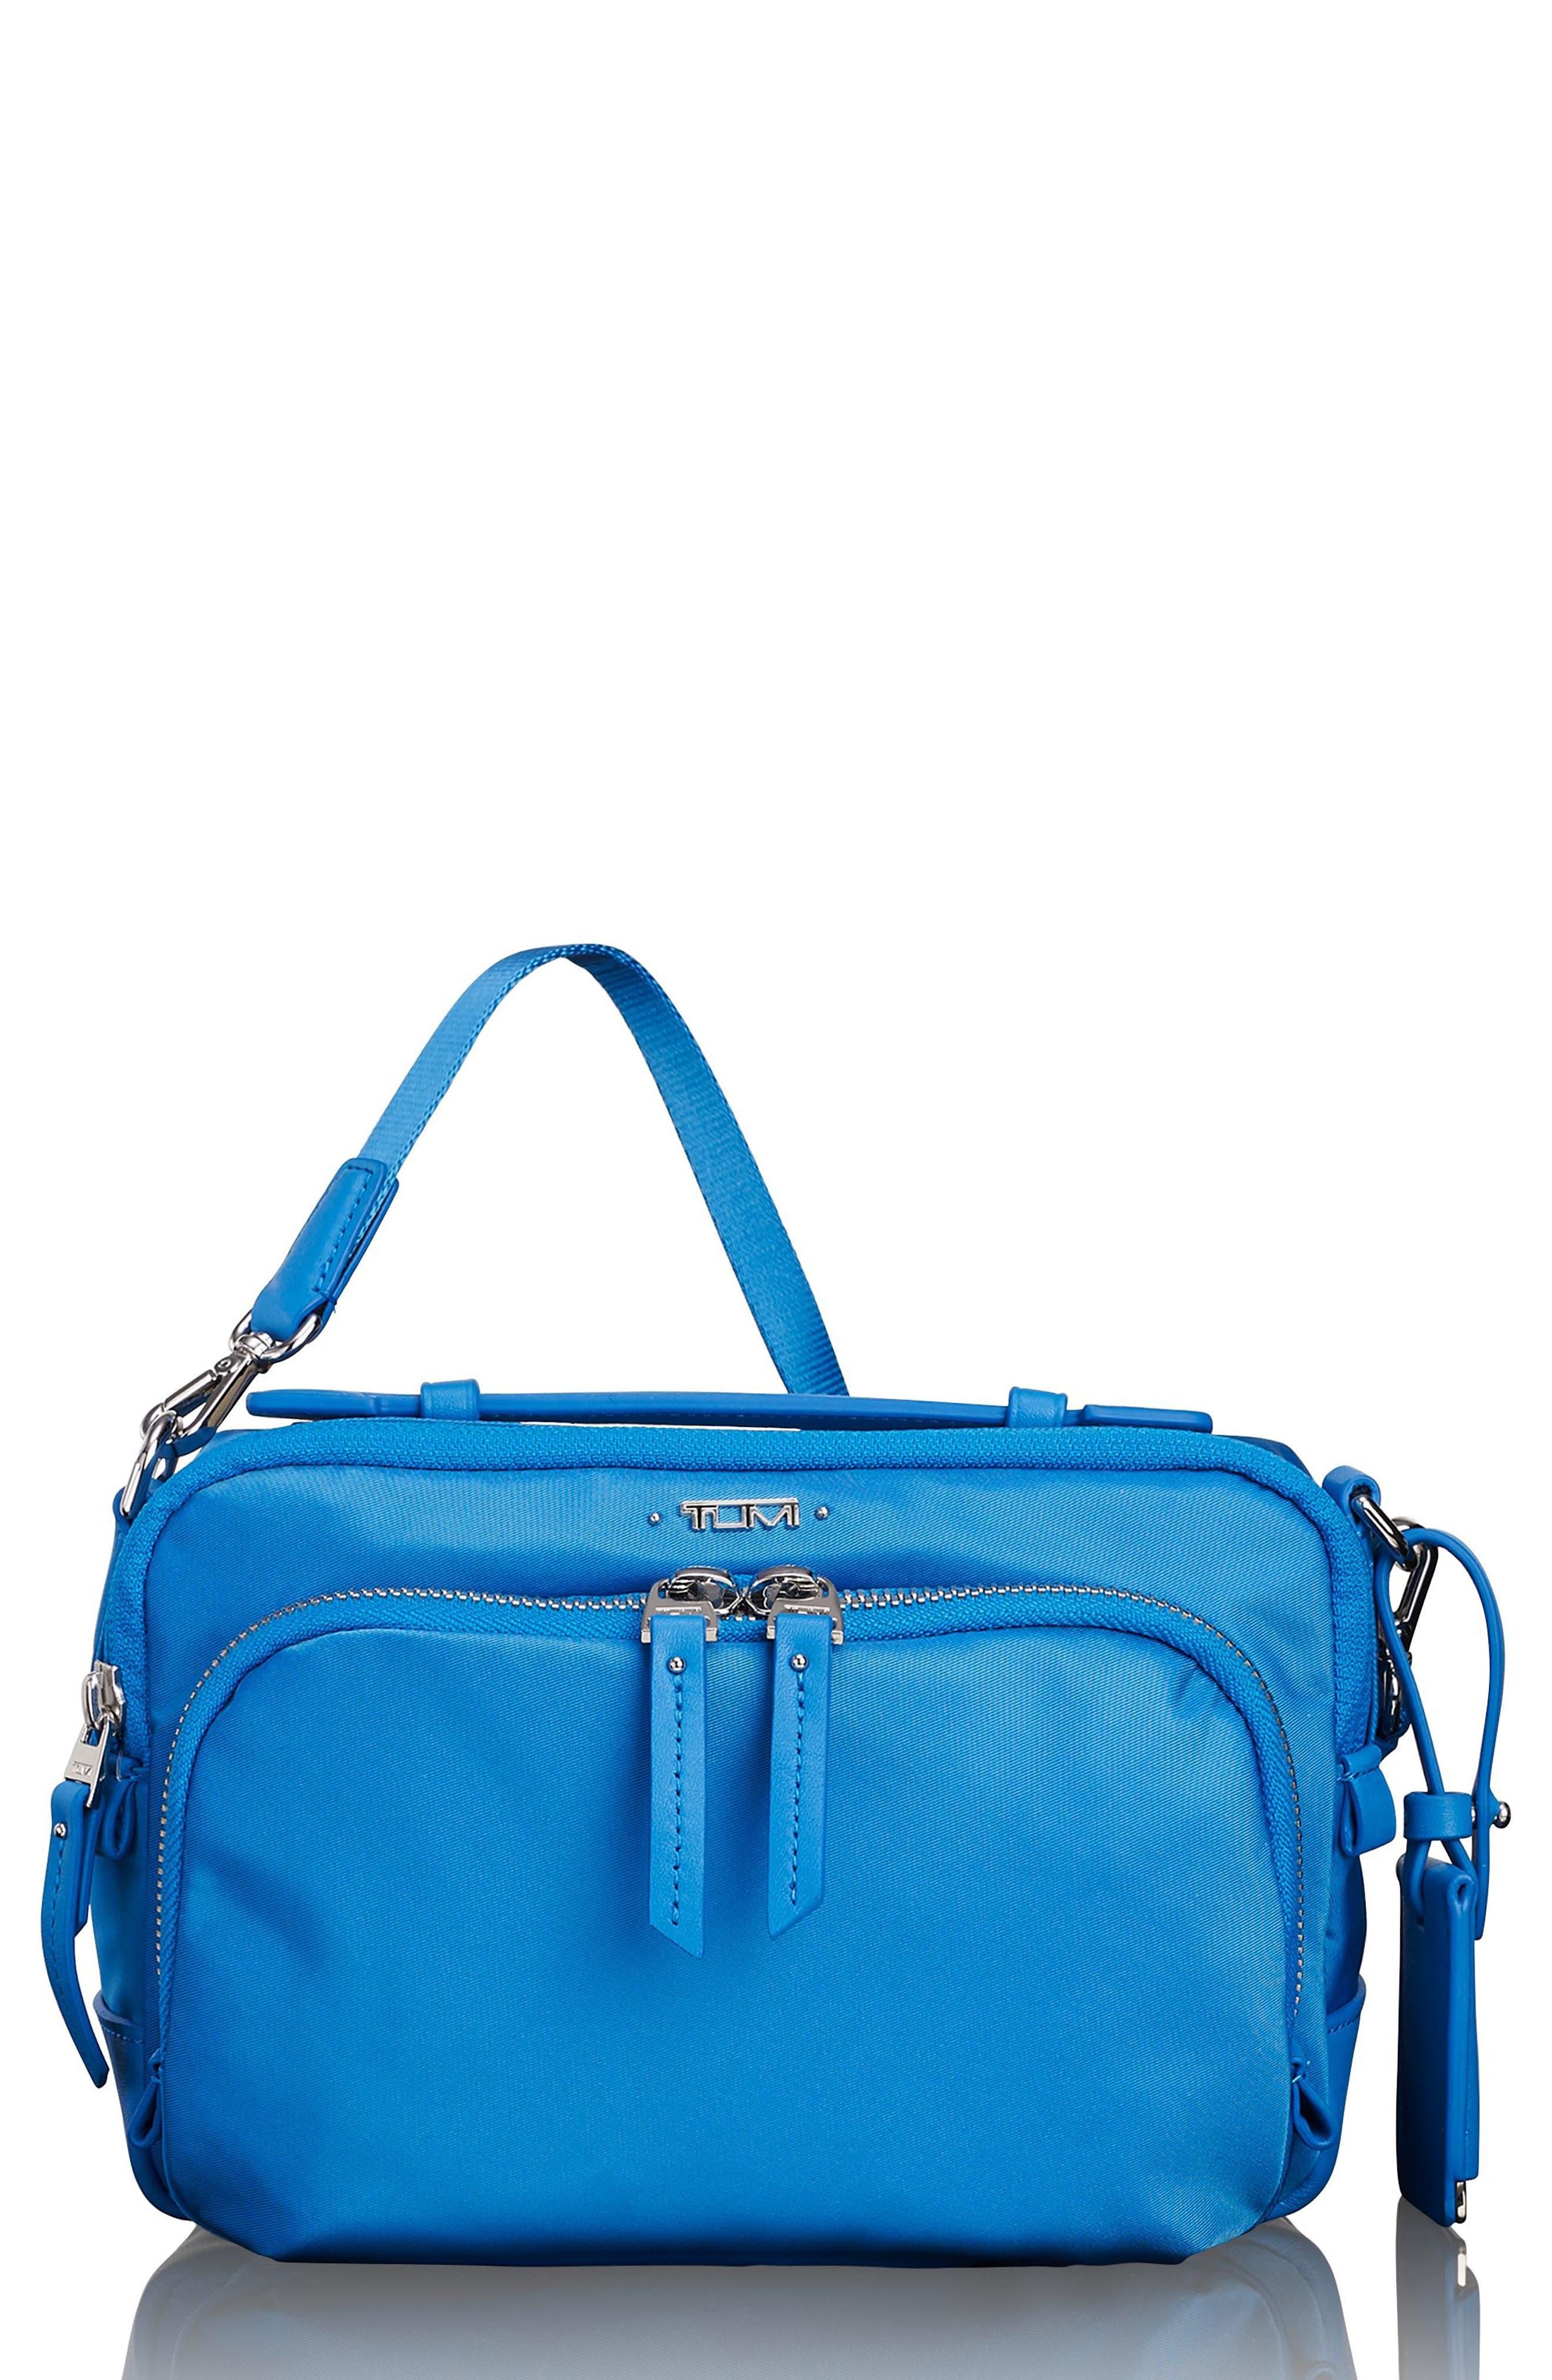 Luanda Crossbody Flight Bag,                             Main thumbnail 1, color,                             Bright Blue